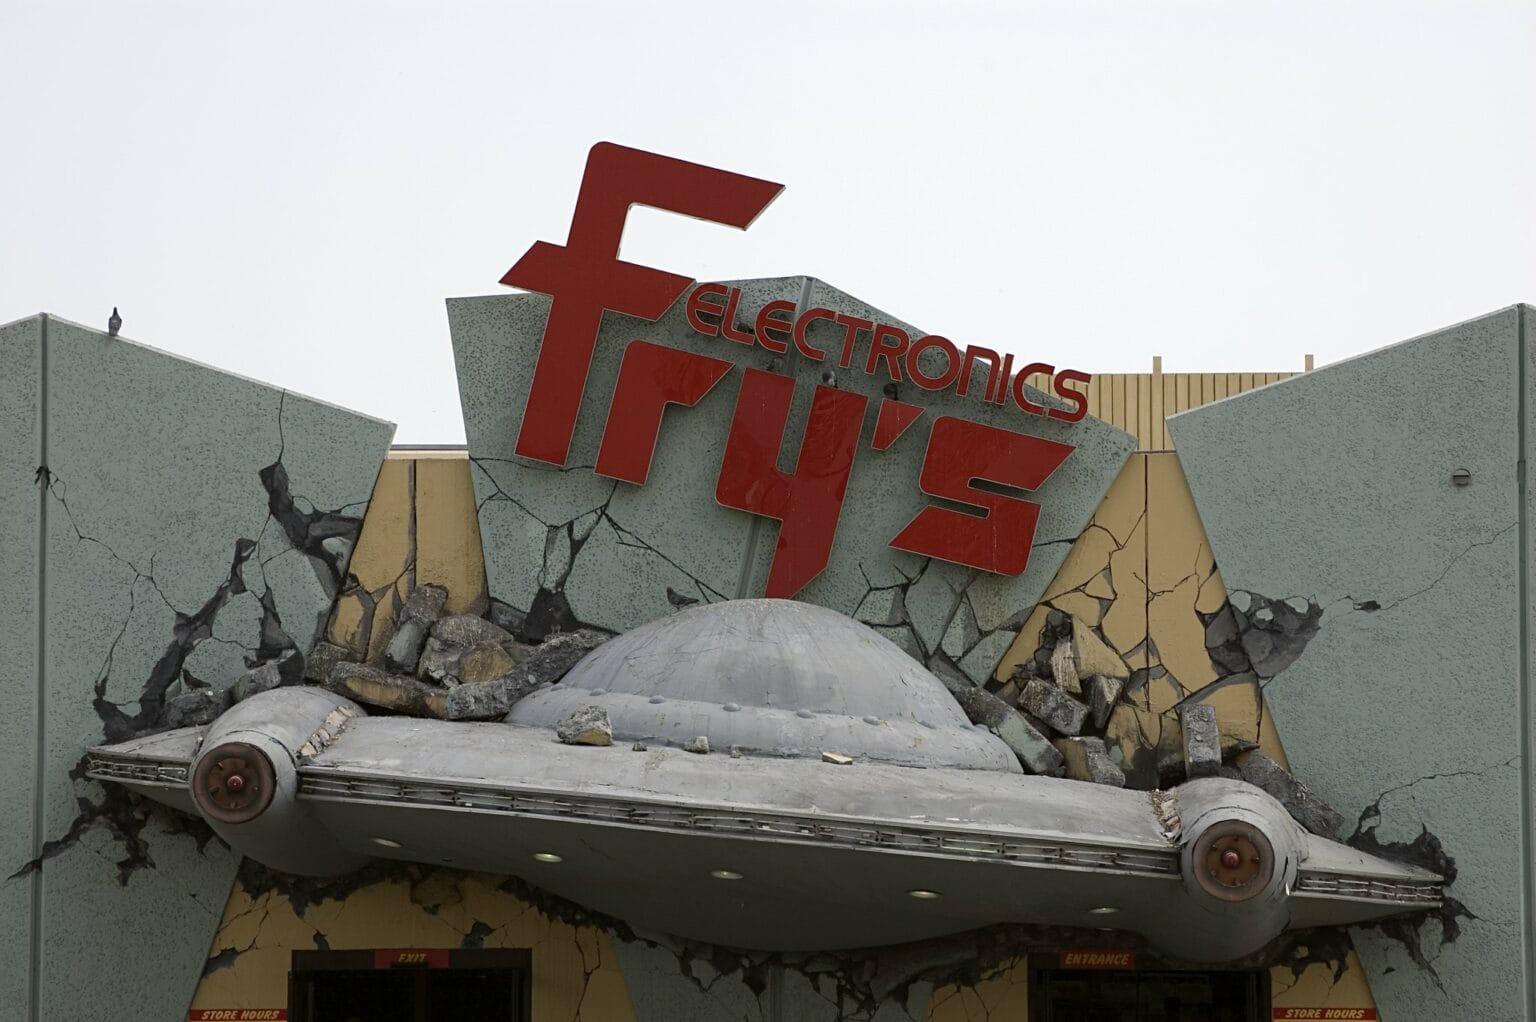 The Fry's Electronics in Burbank, California, had a retro alien invasion theme.